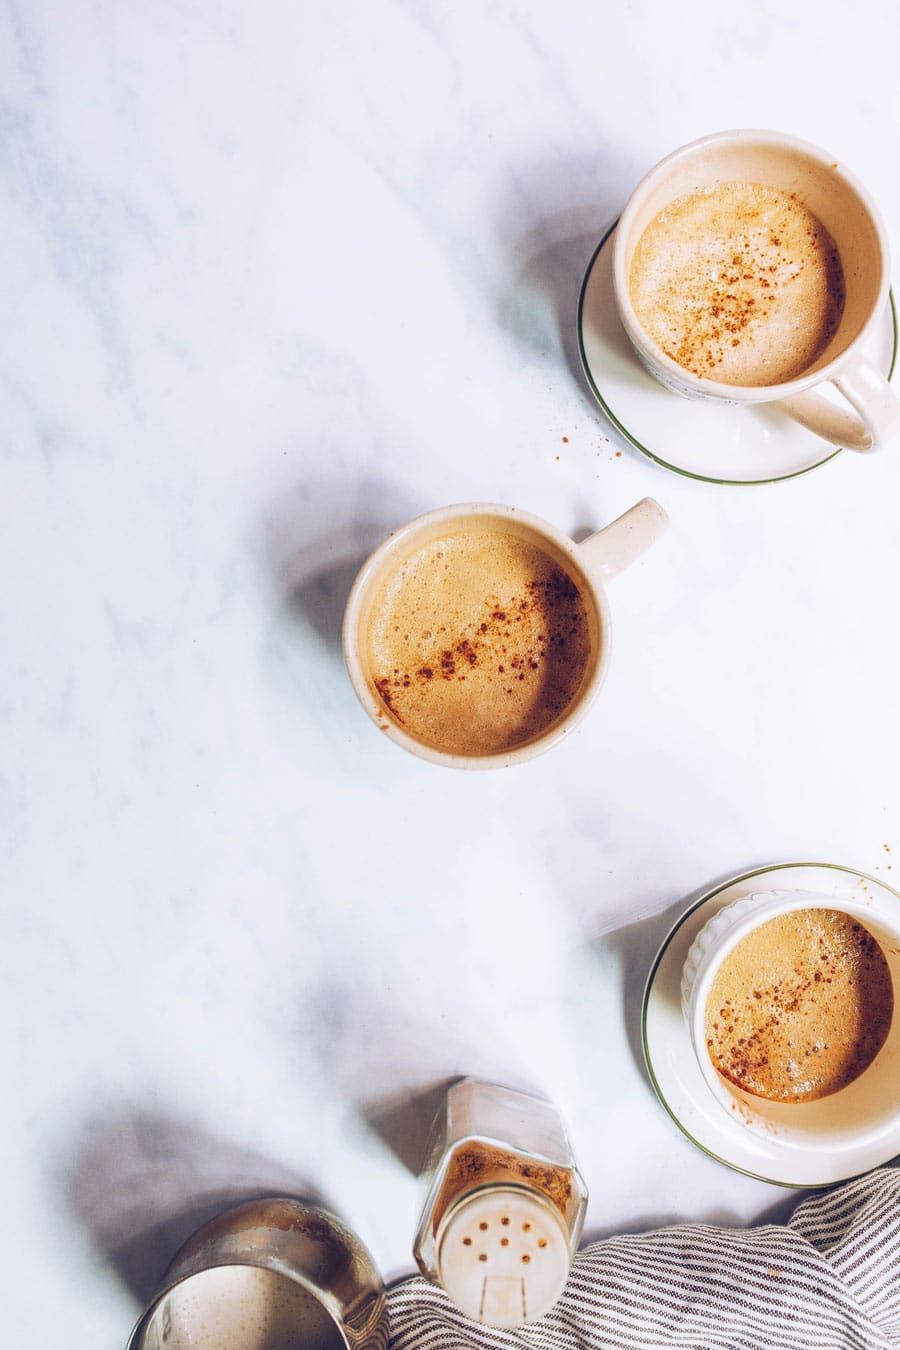 caffeine and your hormones via Food by Mars